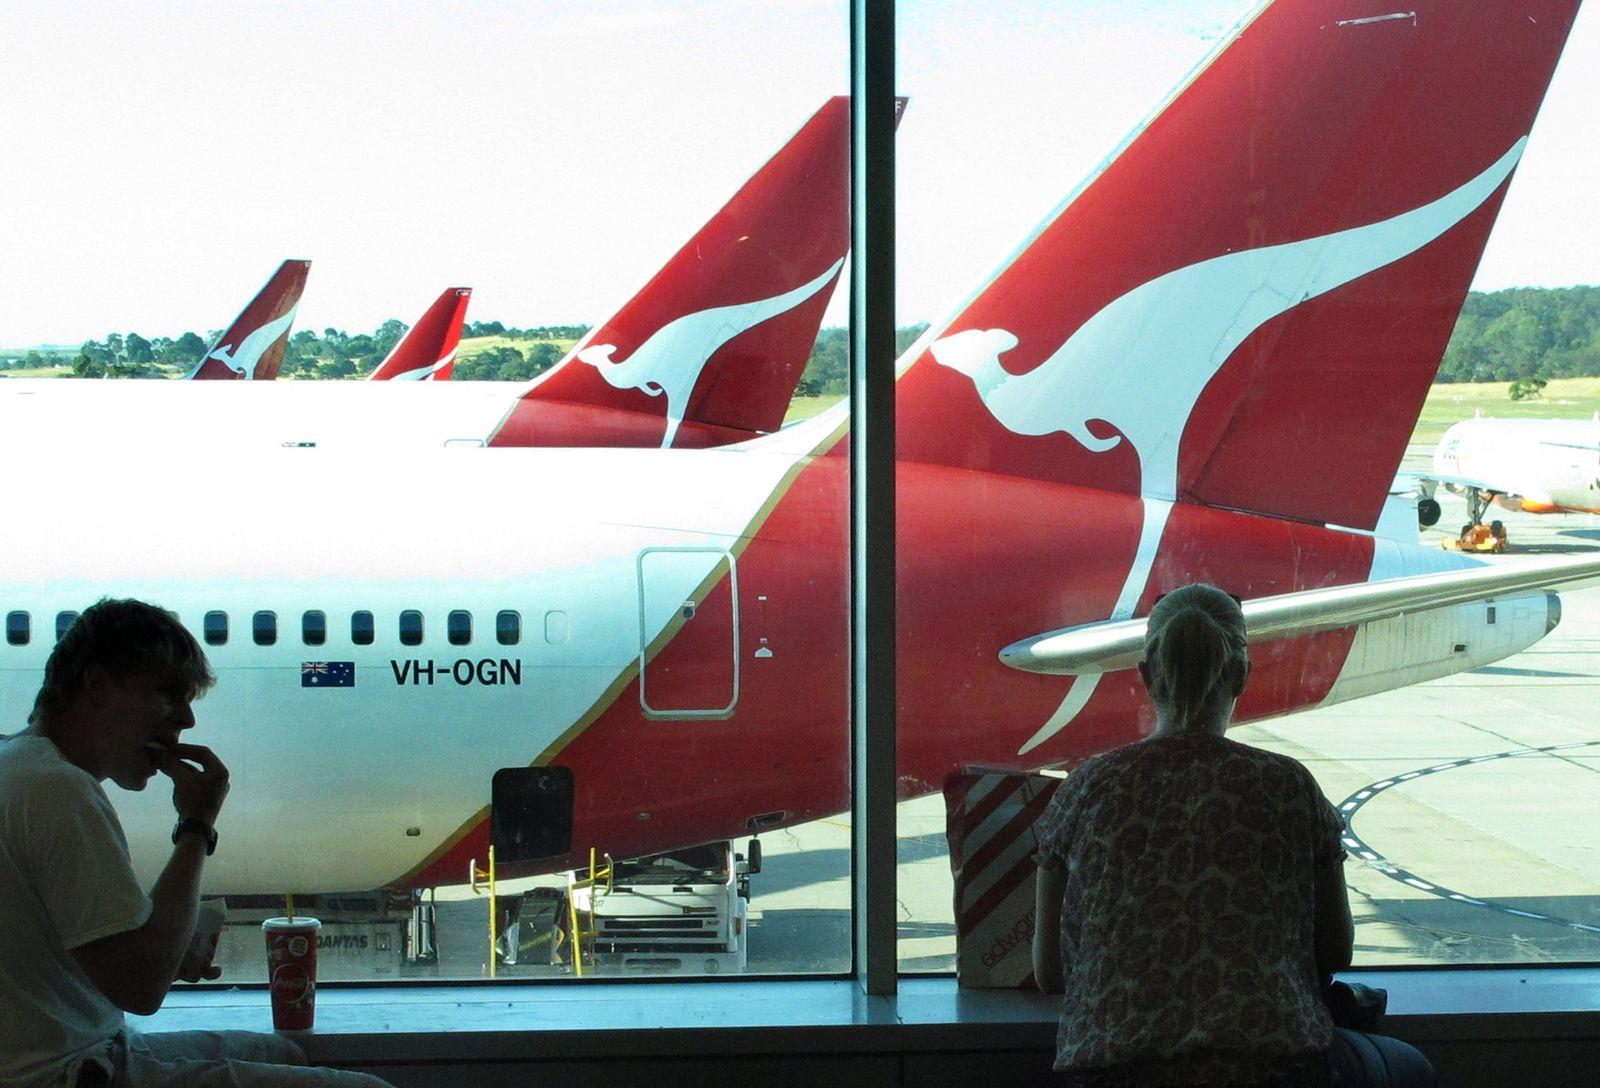 Australian airline carrier Qantas